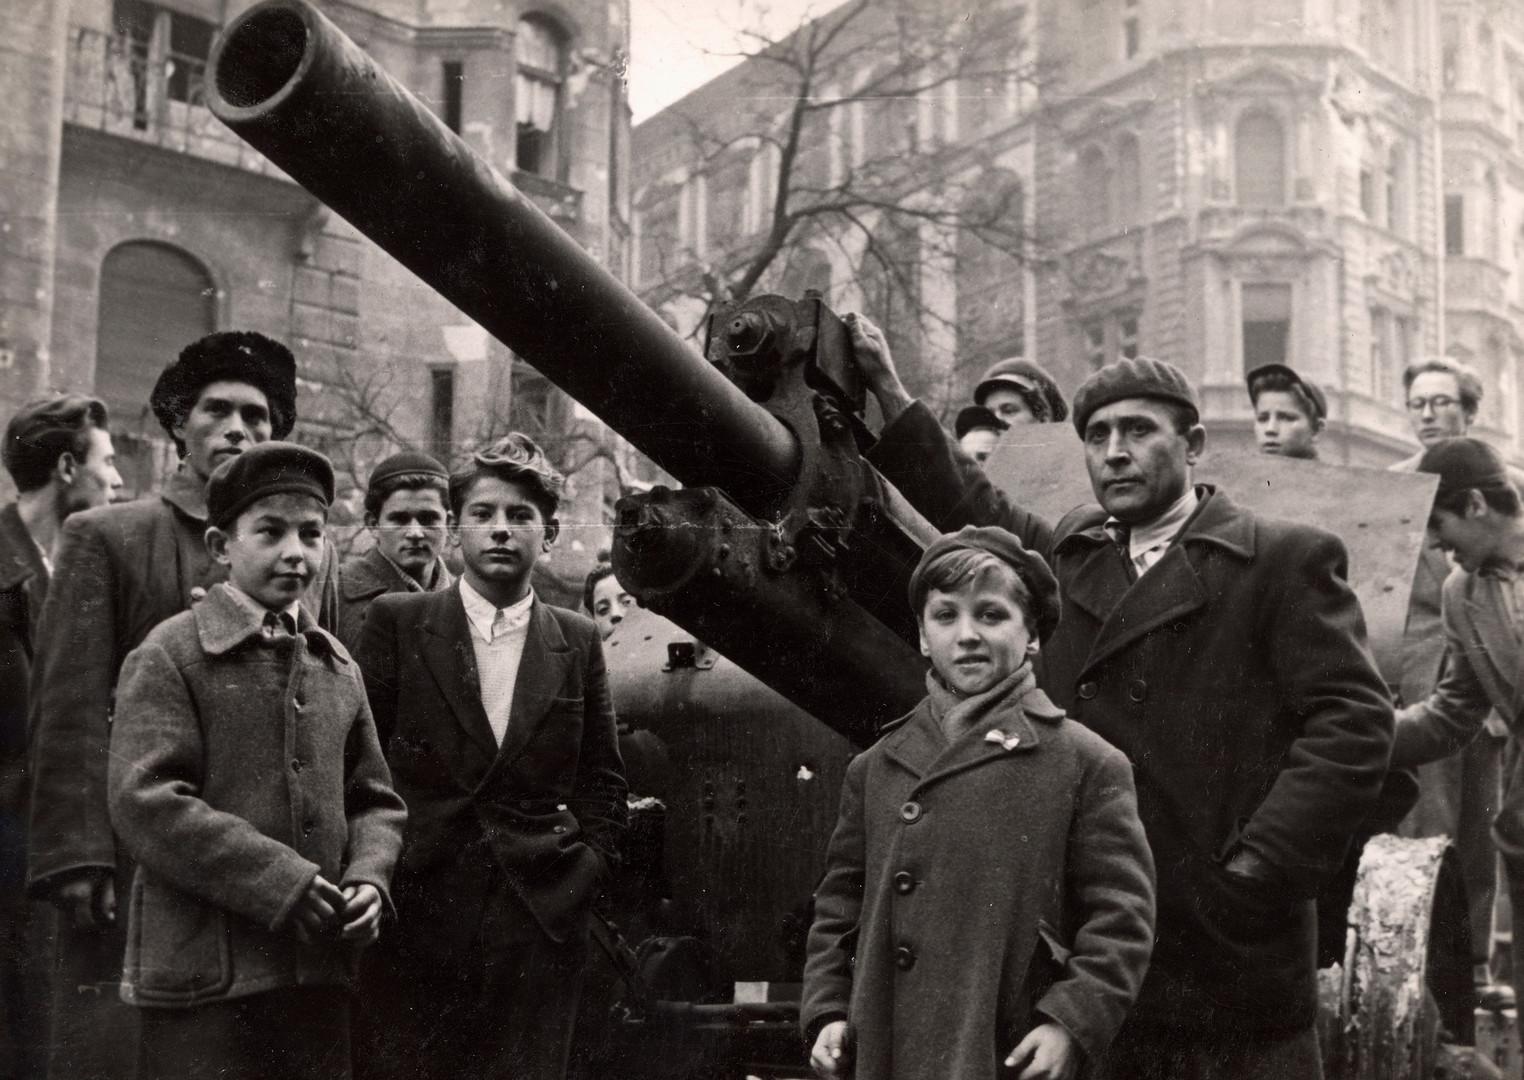 восстание в венгрии 1956